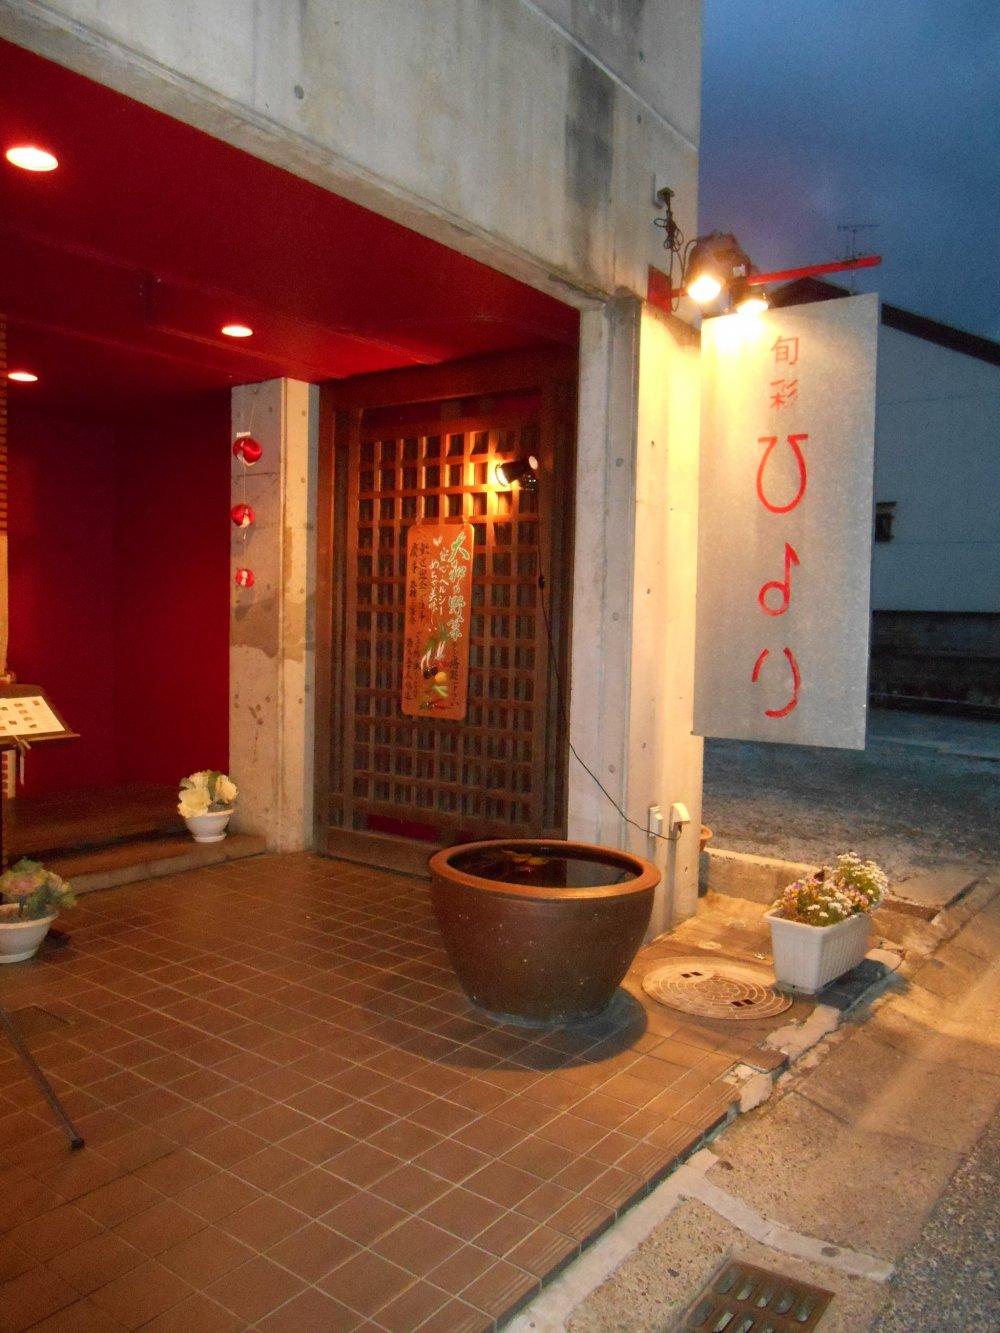 The entrance to Hiyori restaurant